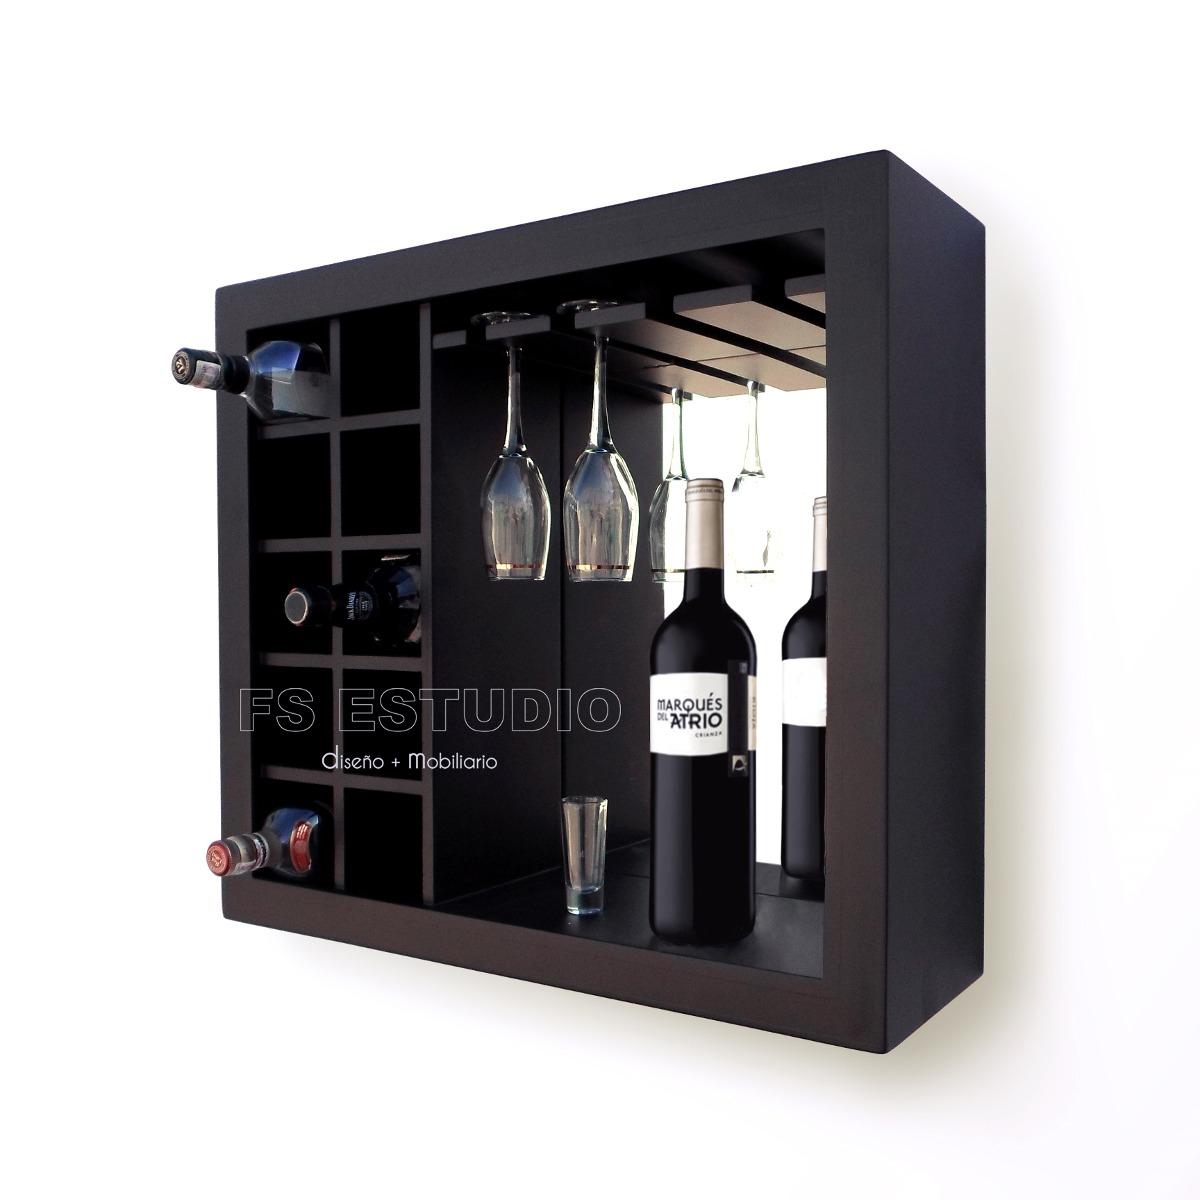 Cava cantina mueble contemporane para vinos copas de for Bar madera moderno